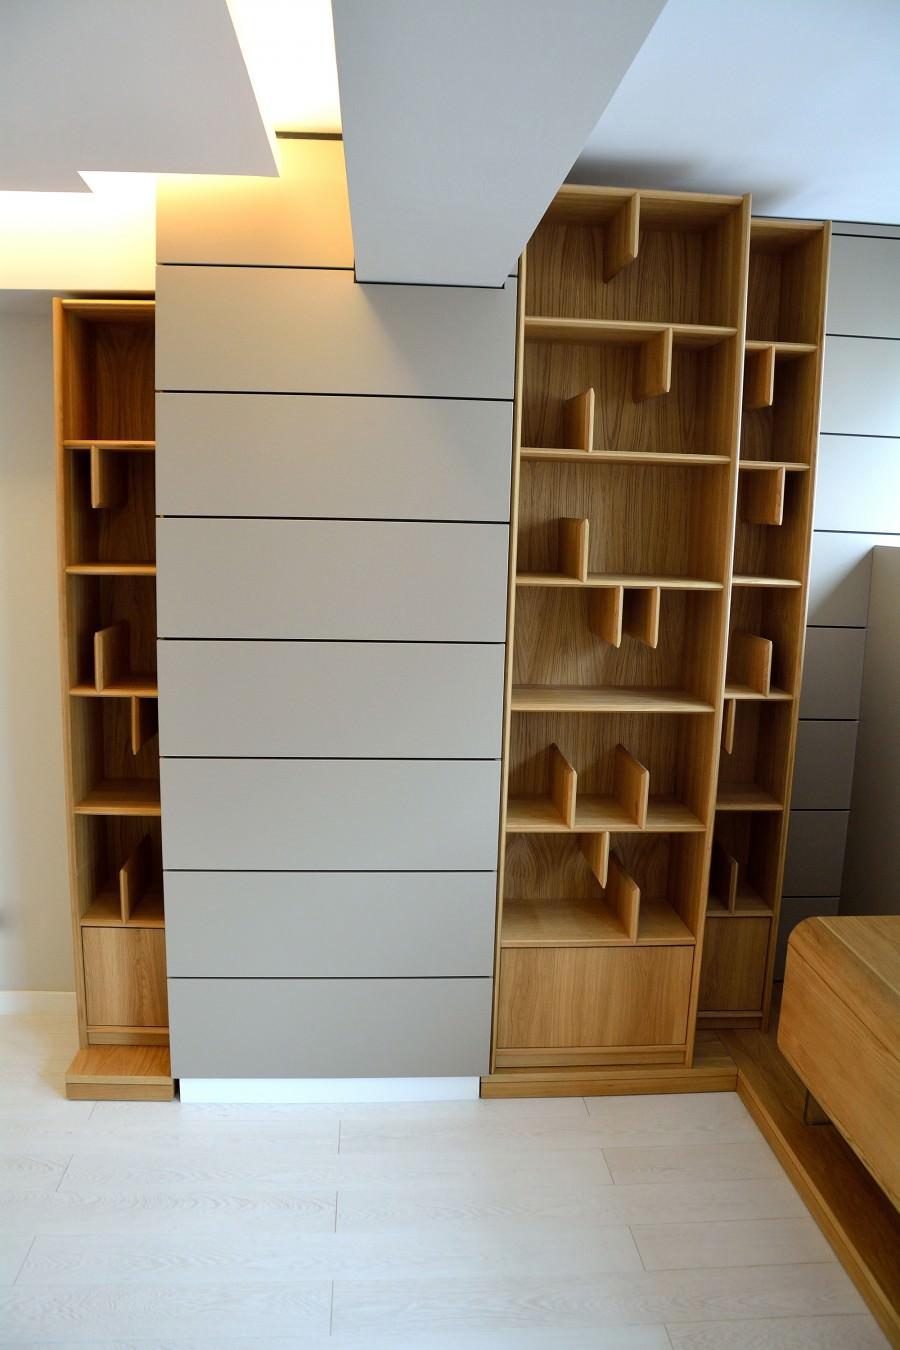 Biblioteca moderna realizata din Lemn masiv stejar natural plasata in living placat in intregime din Mdf Vopsit Mat Gri 900x1350 4